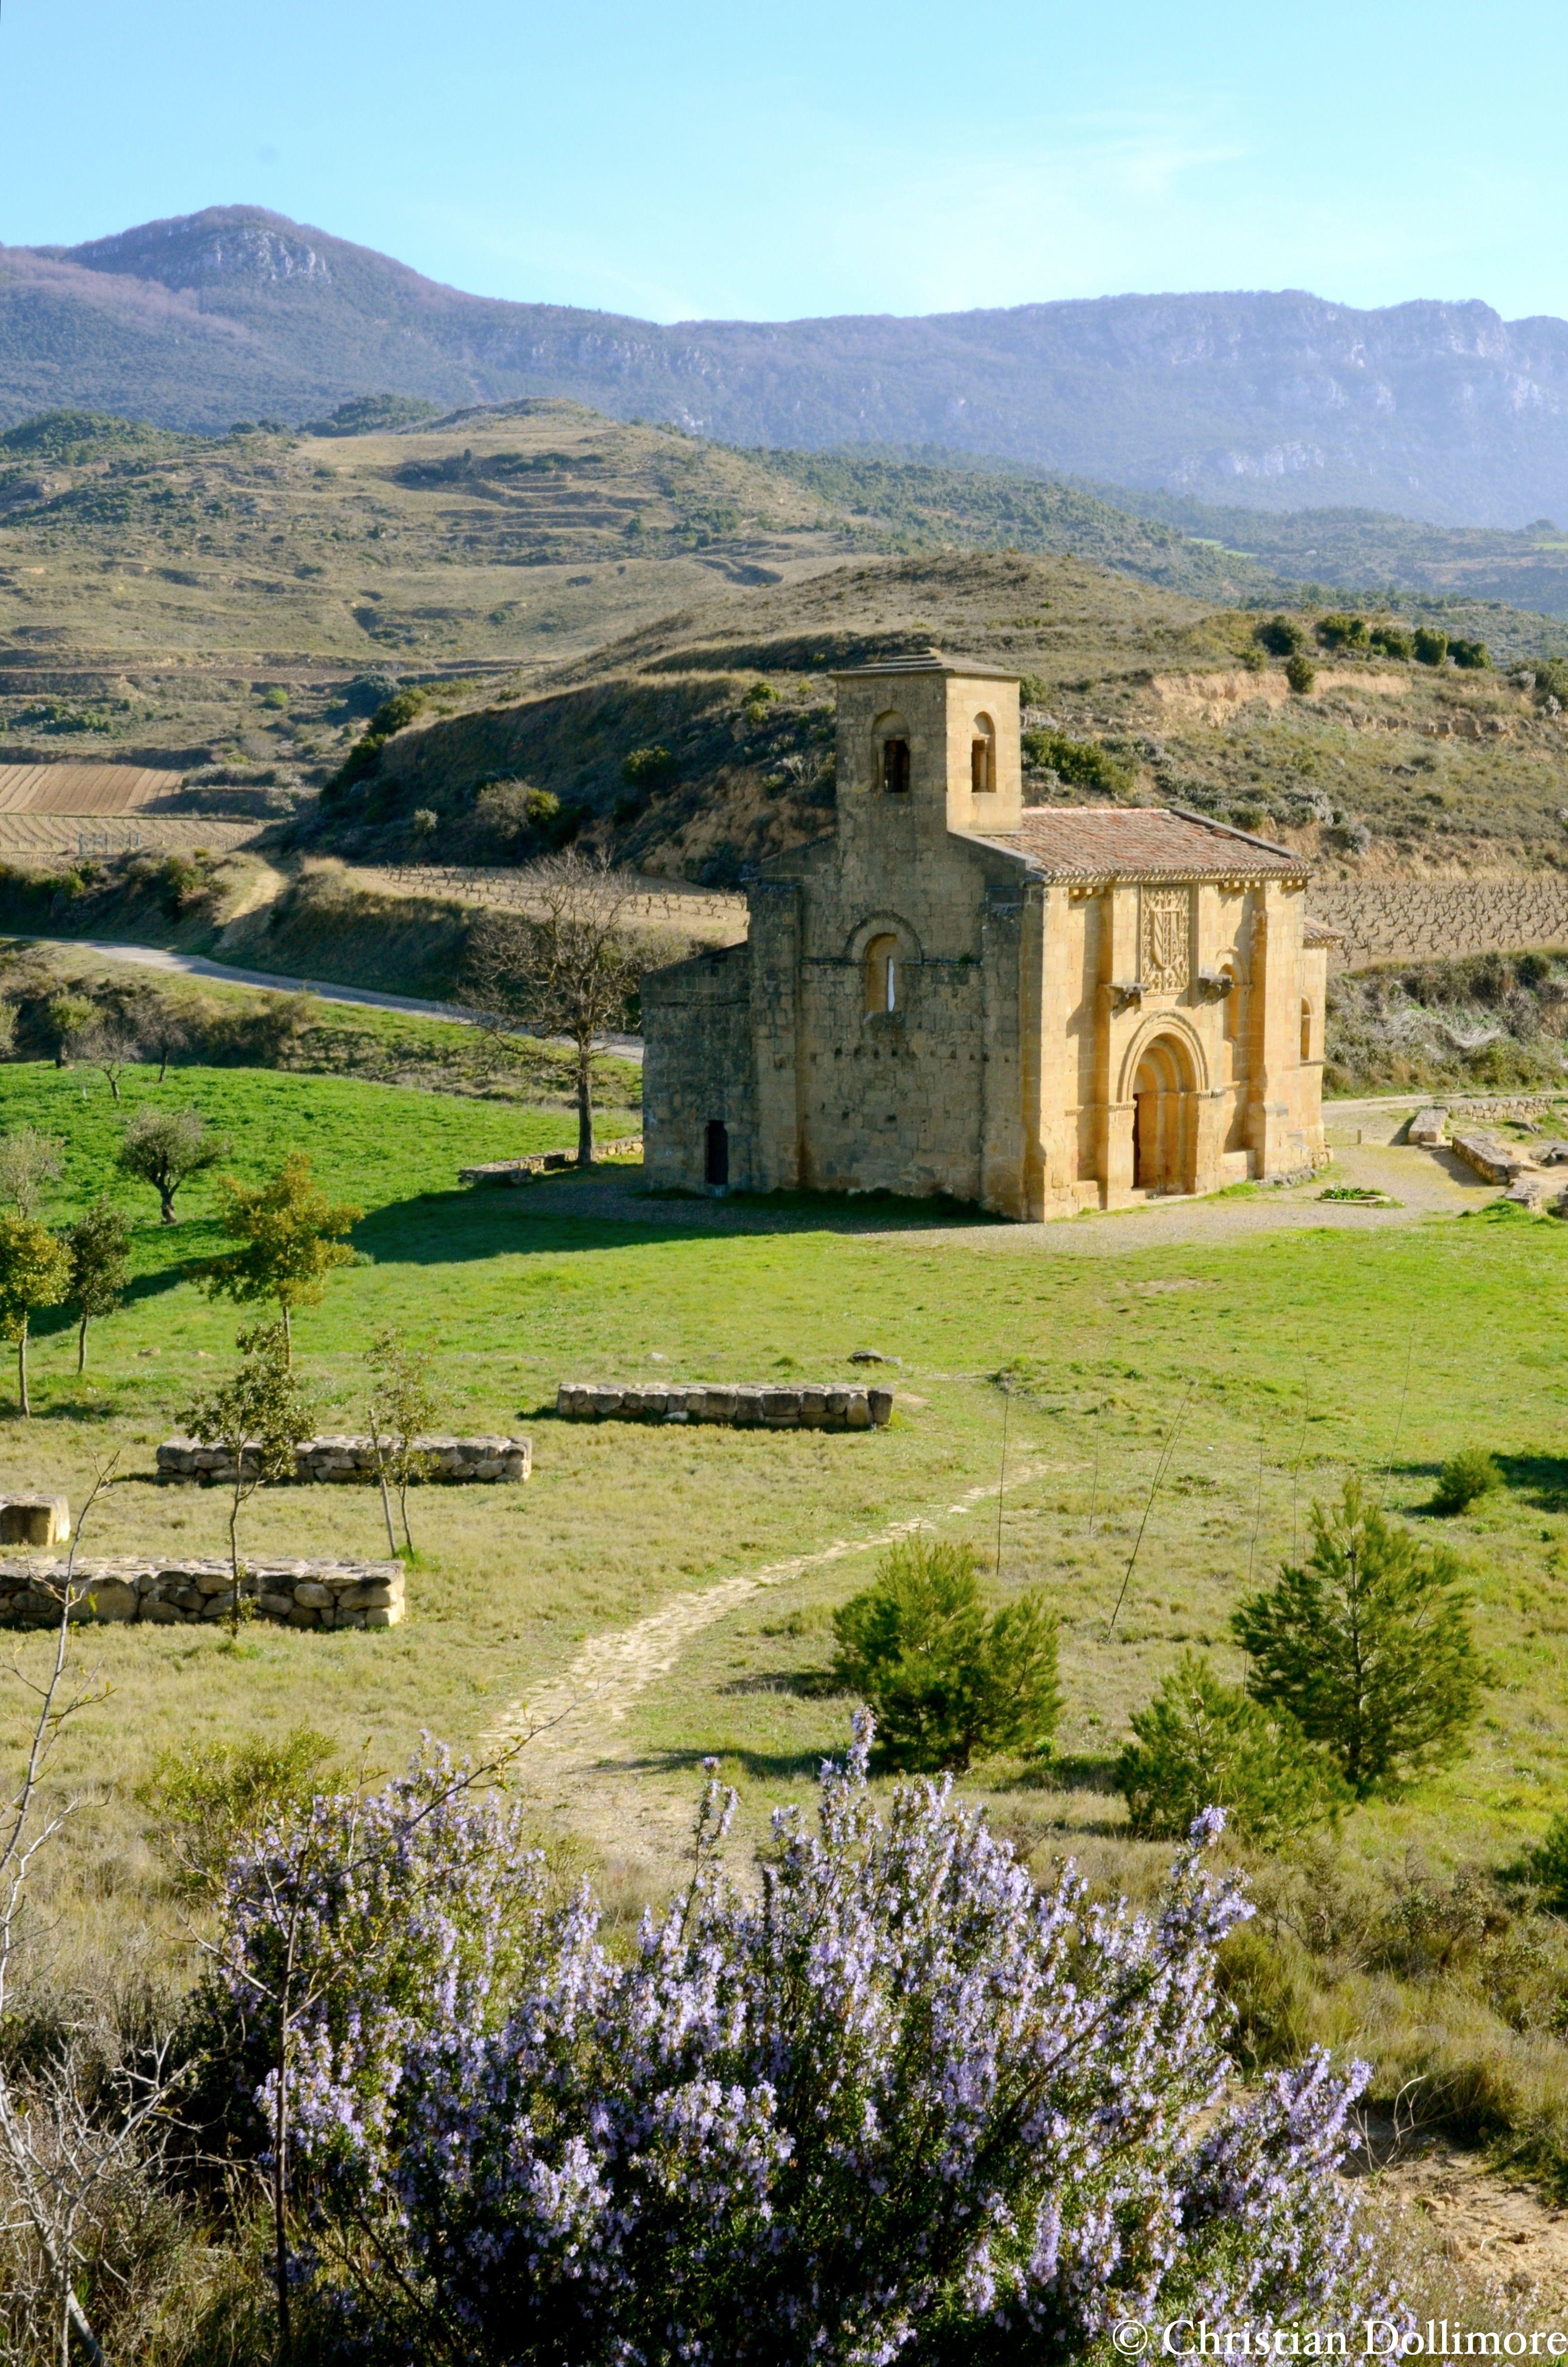 Church Of Santa María De La Piscina The Only Remaining Building Of A Long Abandoned Village In The Countryside Of La R Abandoned Village La Rioja Countryside